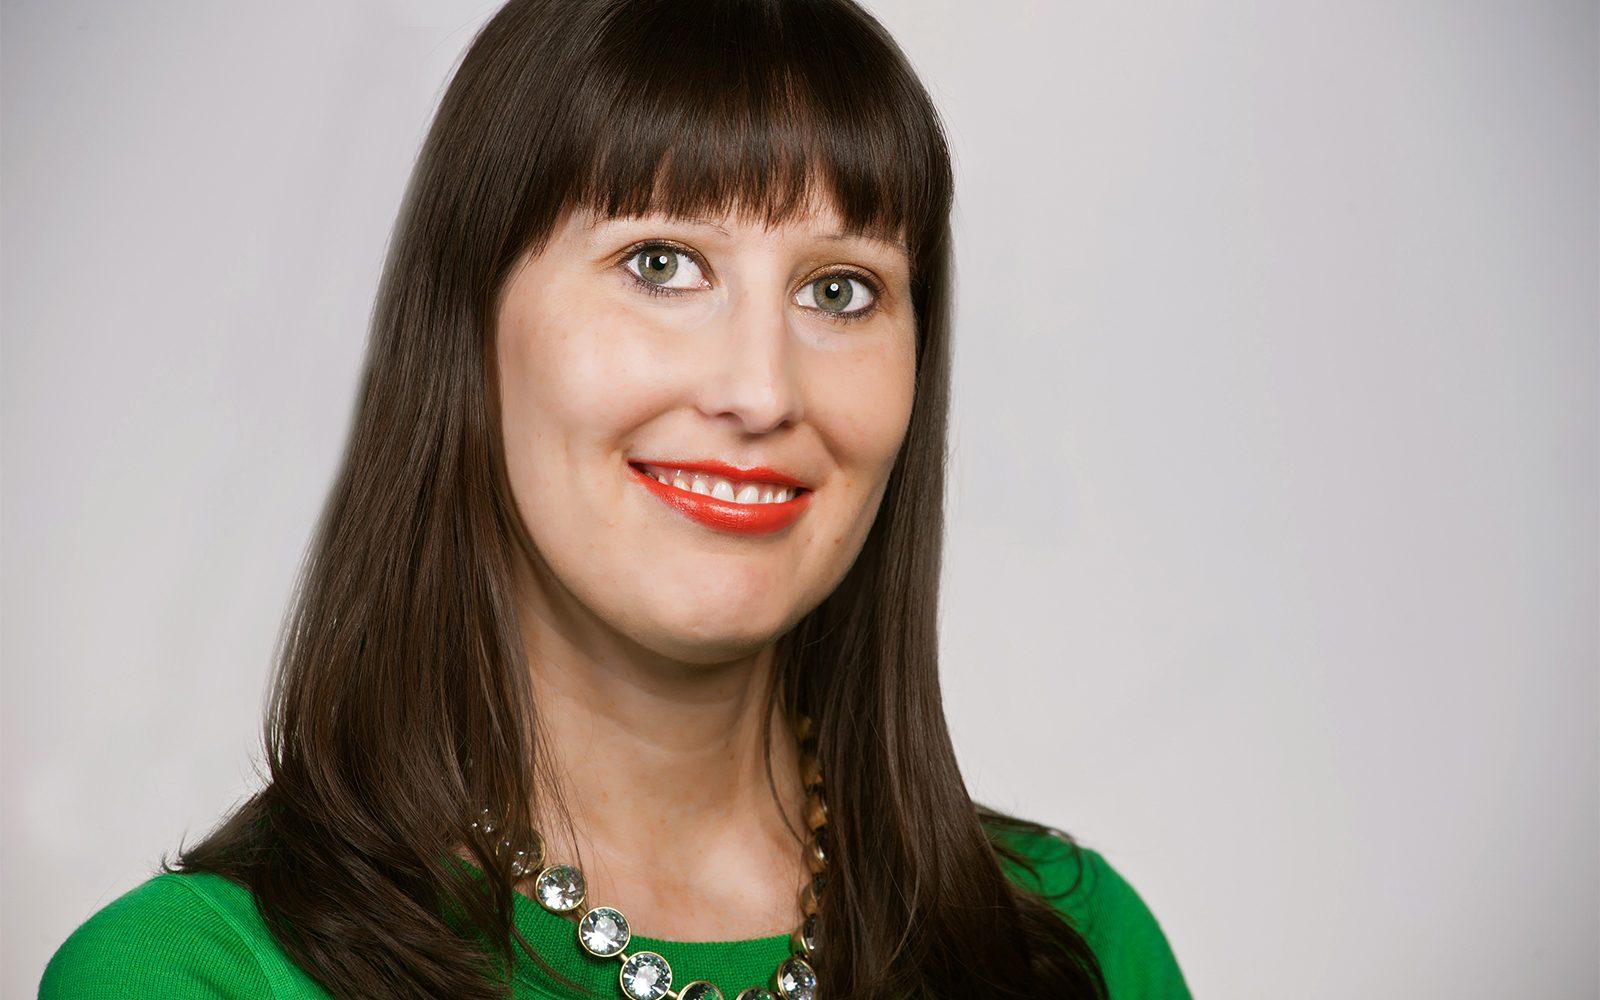 Jill Doerfler UMD Proffessor and Author